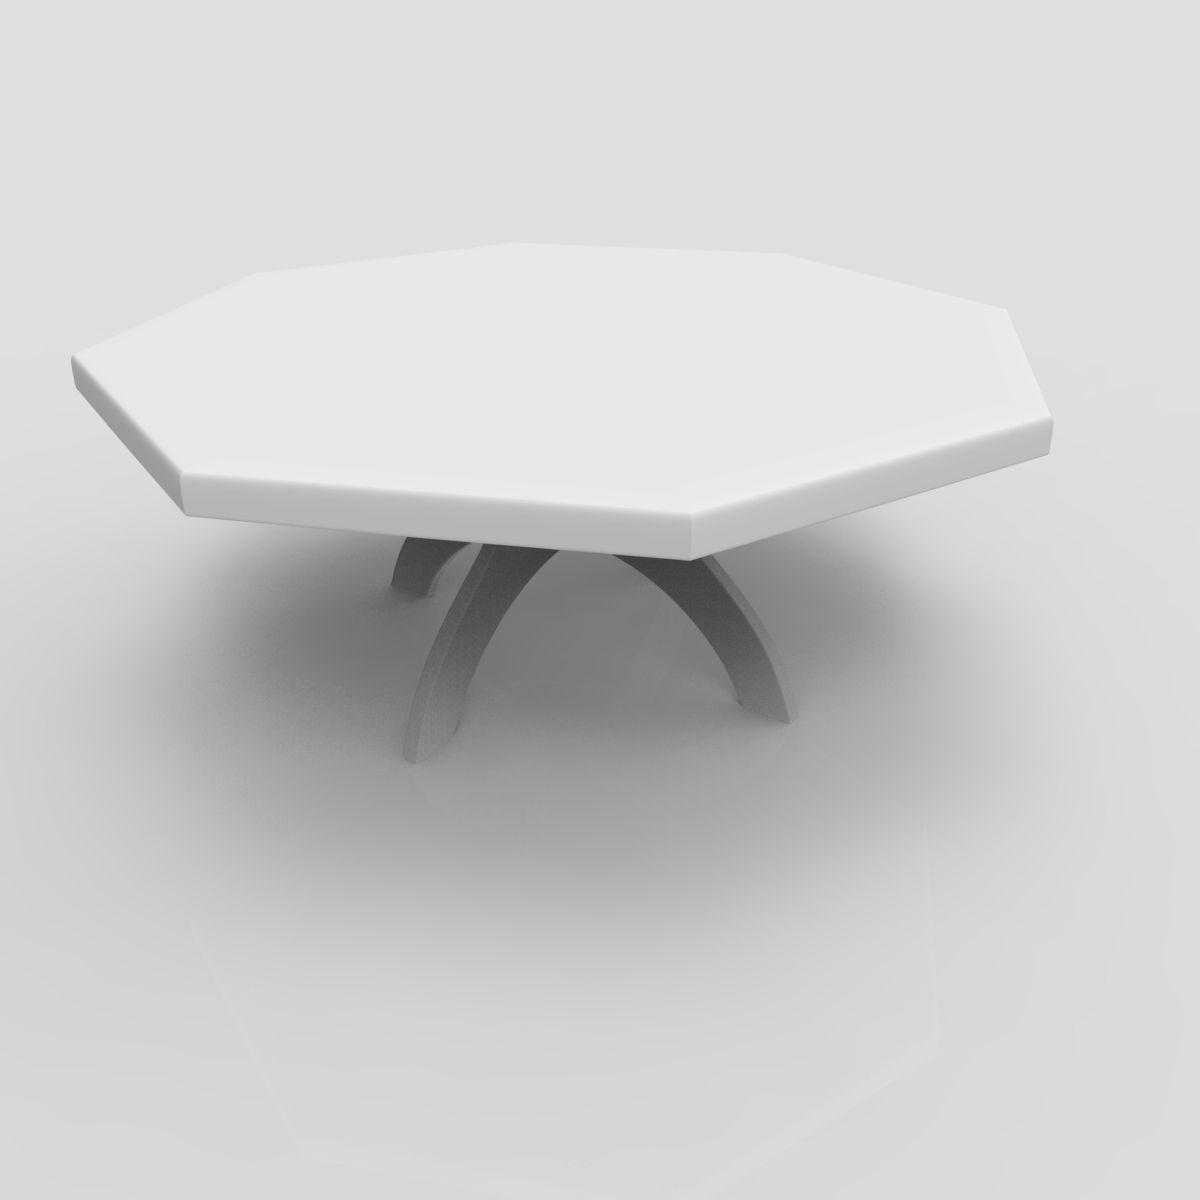 Miniature 3d Print Mini Coffee Table 3d Model 3d Printable Stl